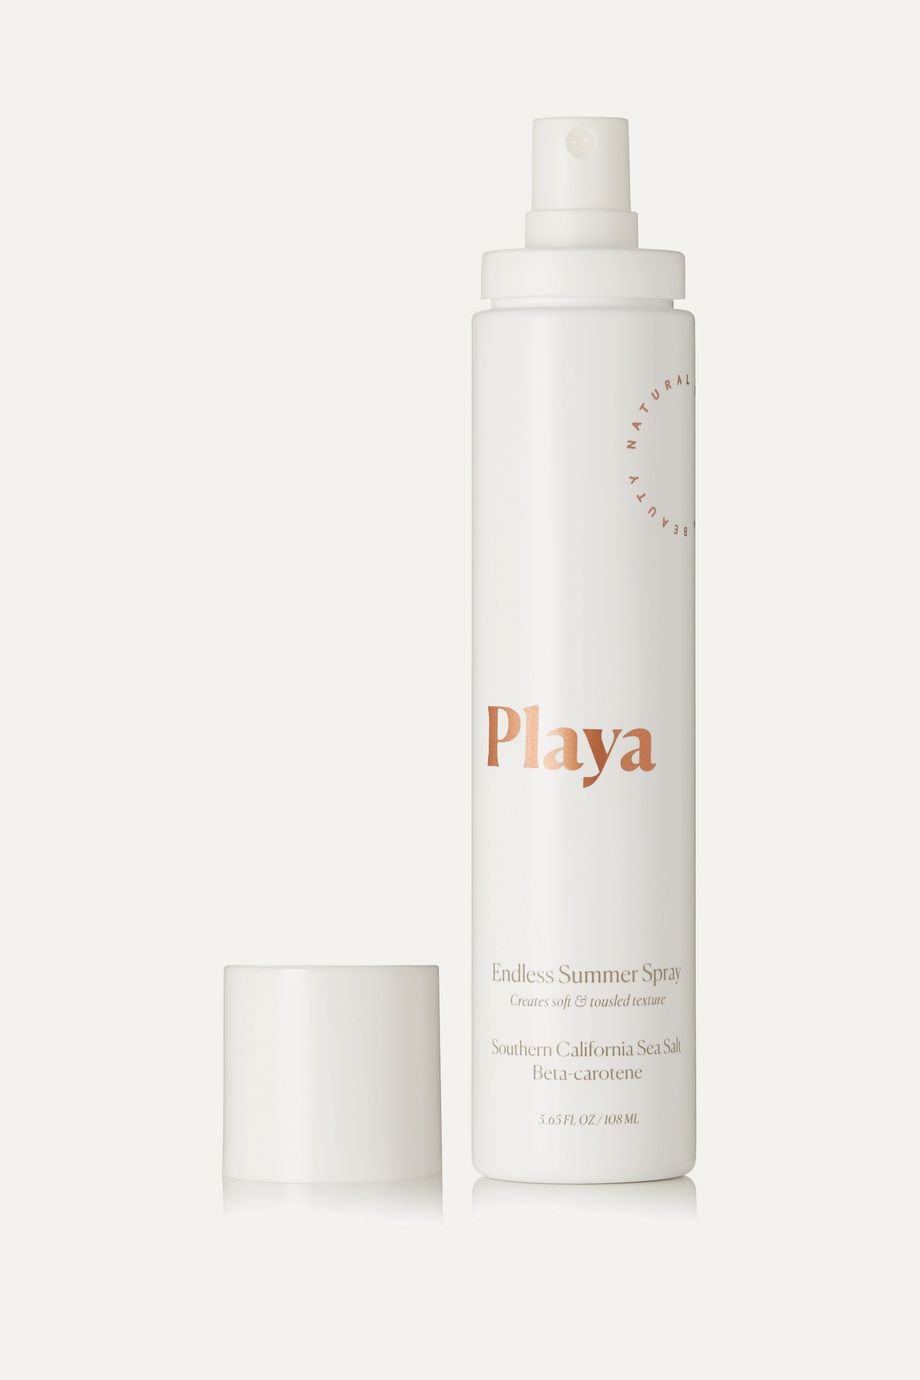 Playa Beauty Endless Summer Spray, 108ml